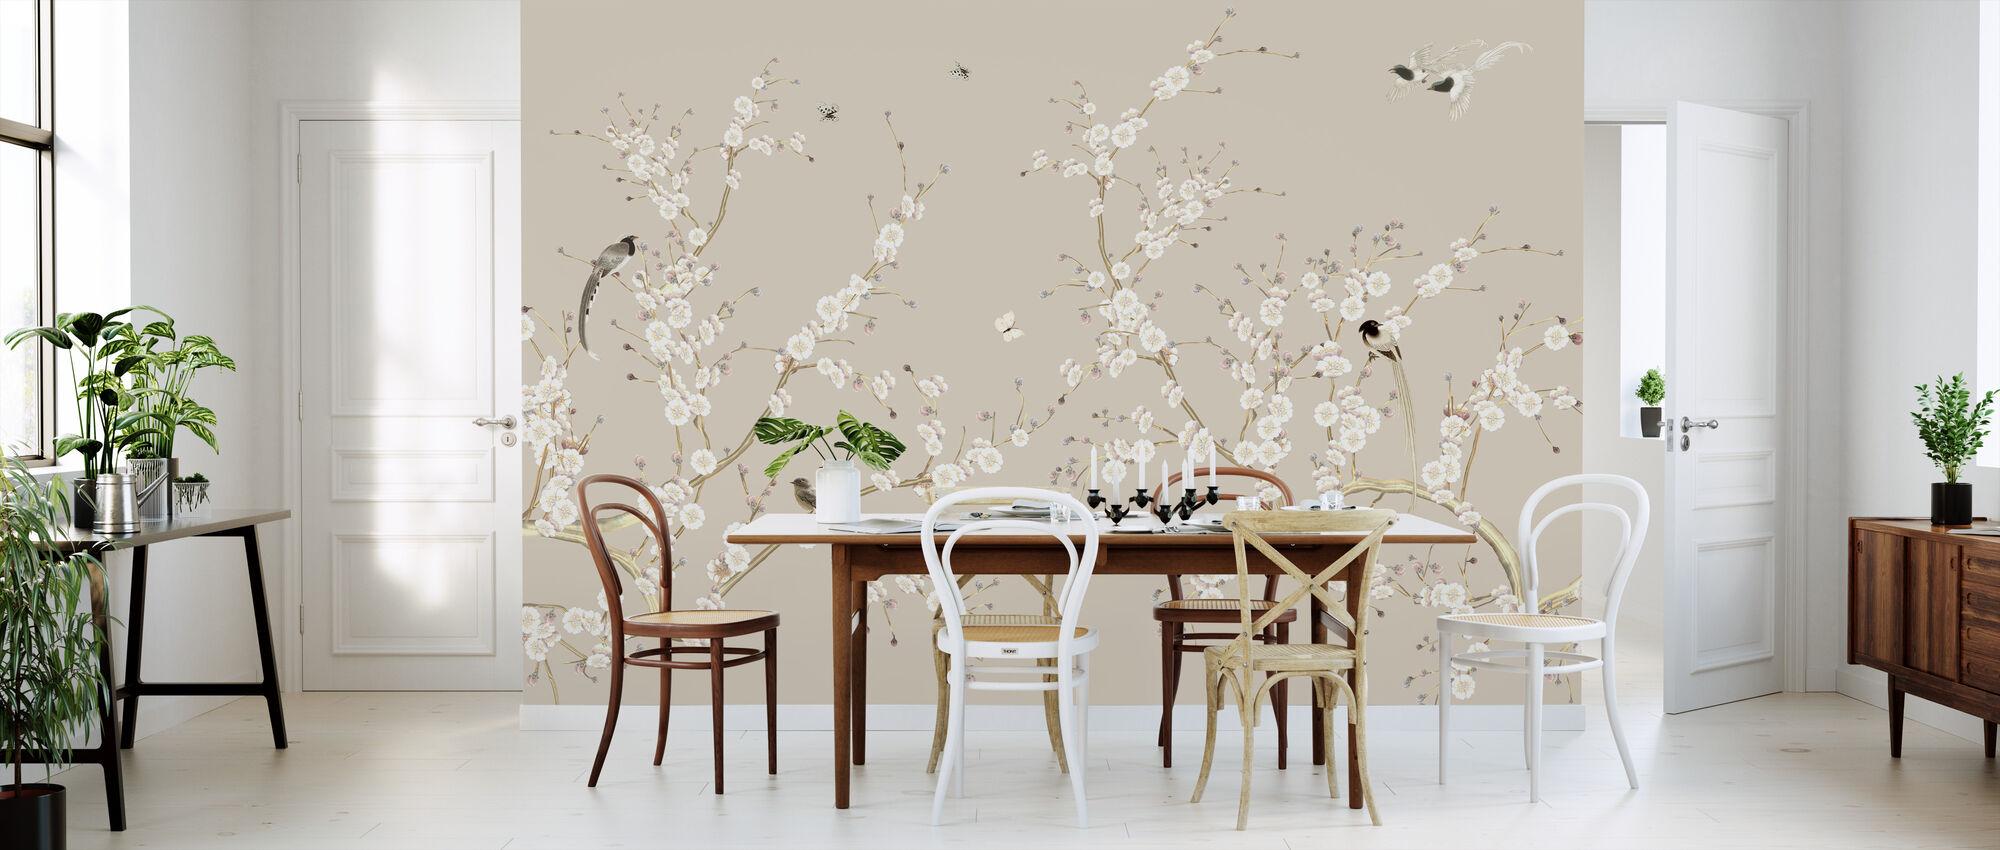 Flowering - Wallpaper - Kitchen